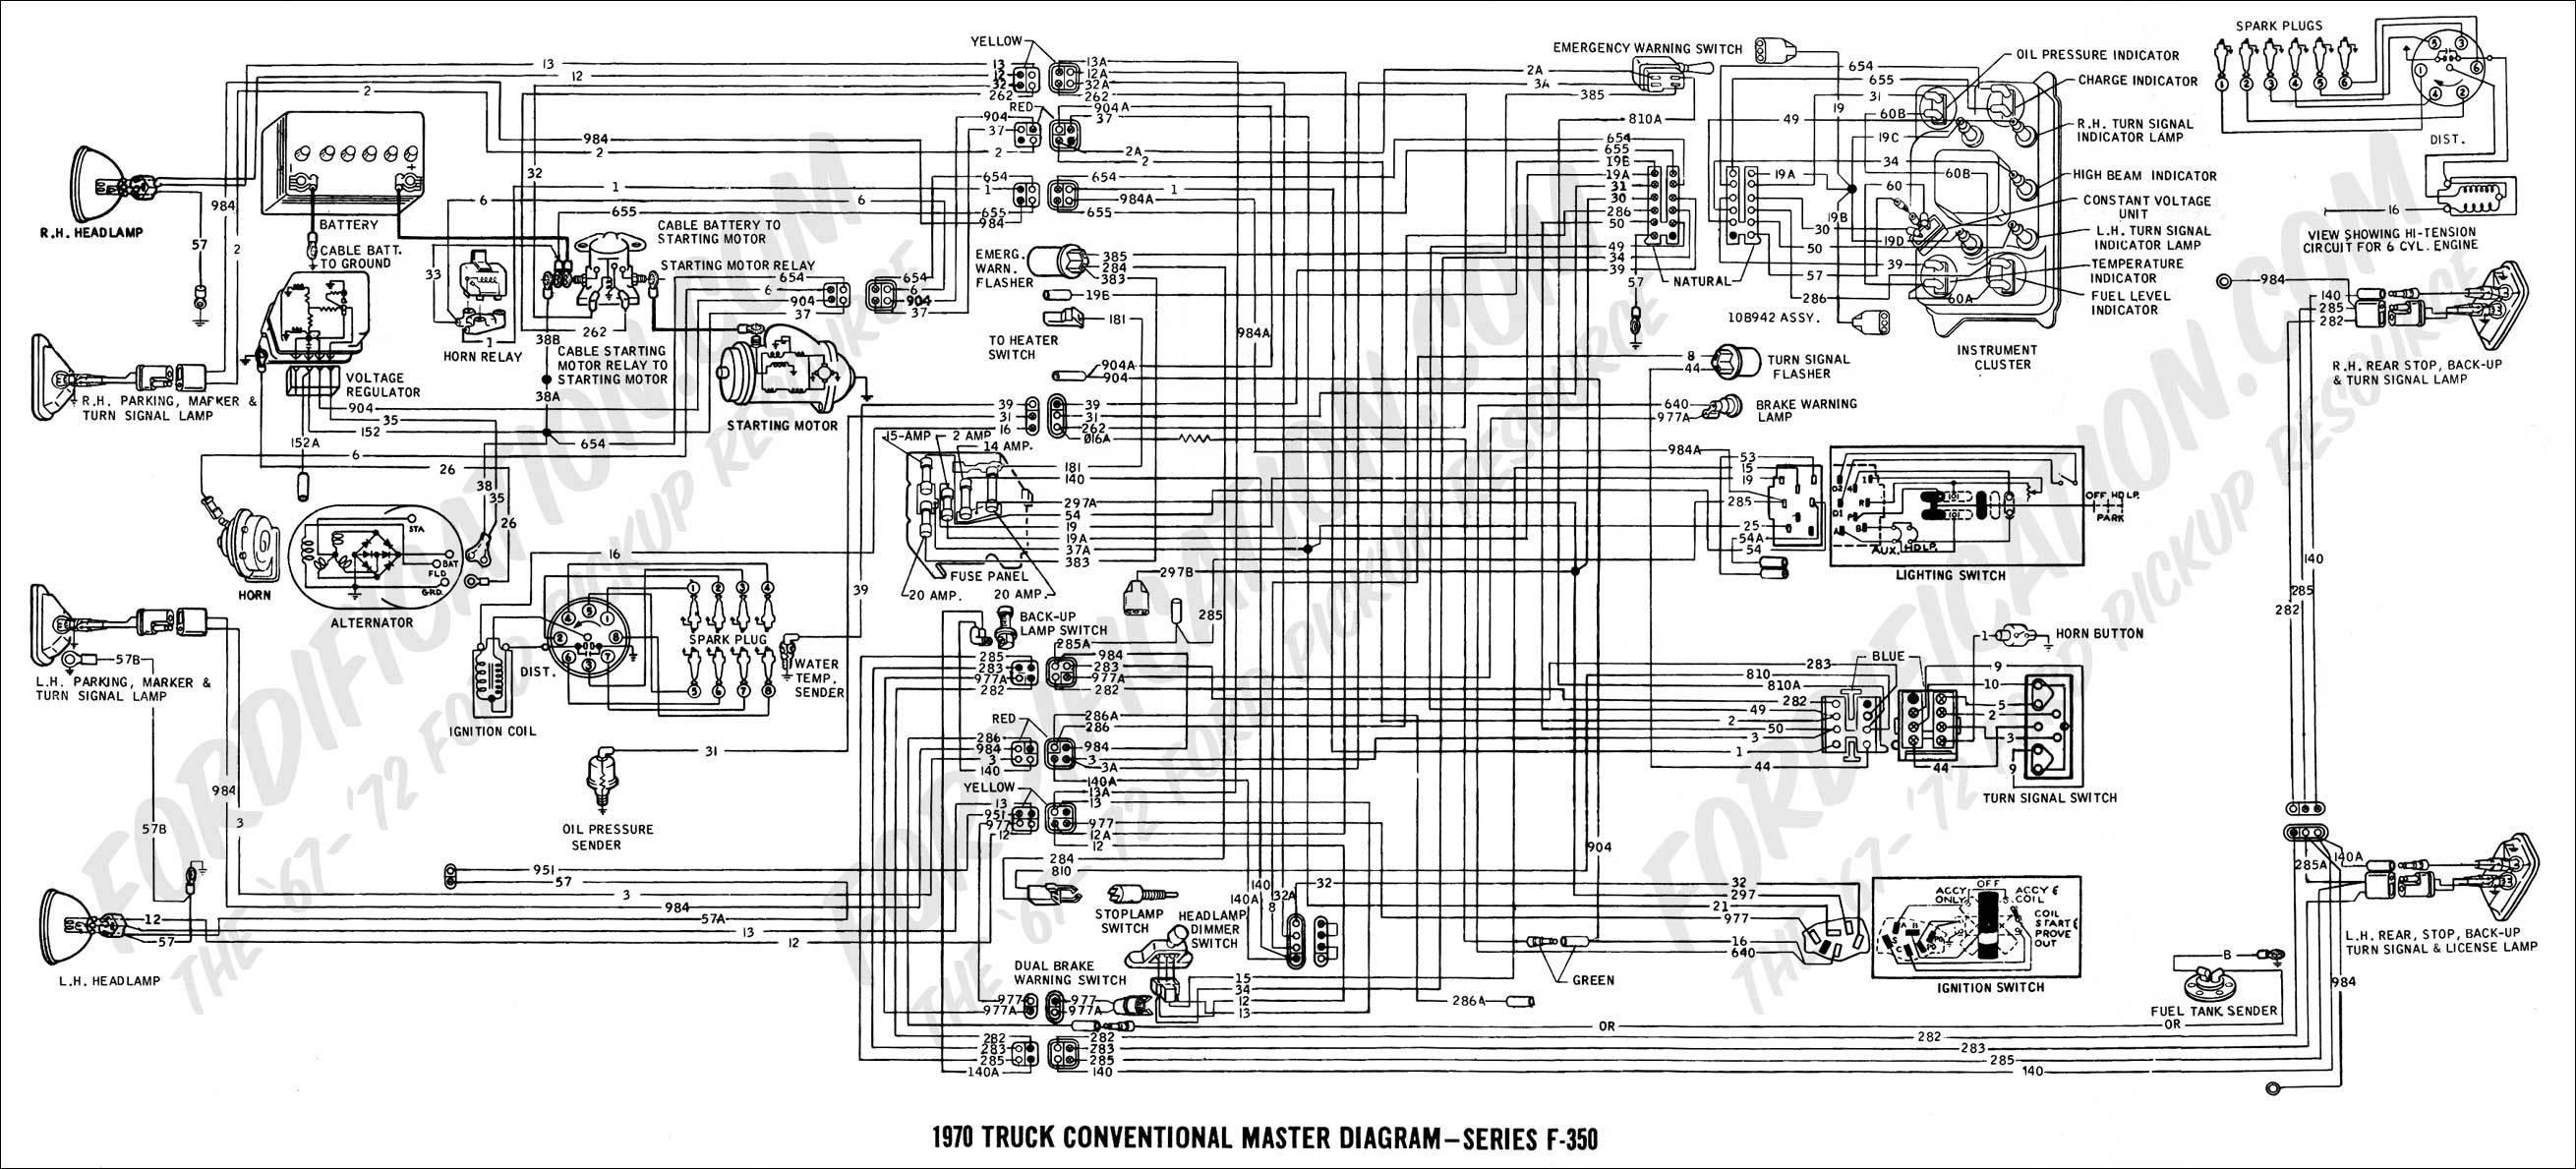 Electrical Wiring Diagrams For Dummies Diesel Generator Control Tr250 Diagram Peterbilt Blurts Of